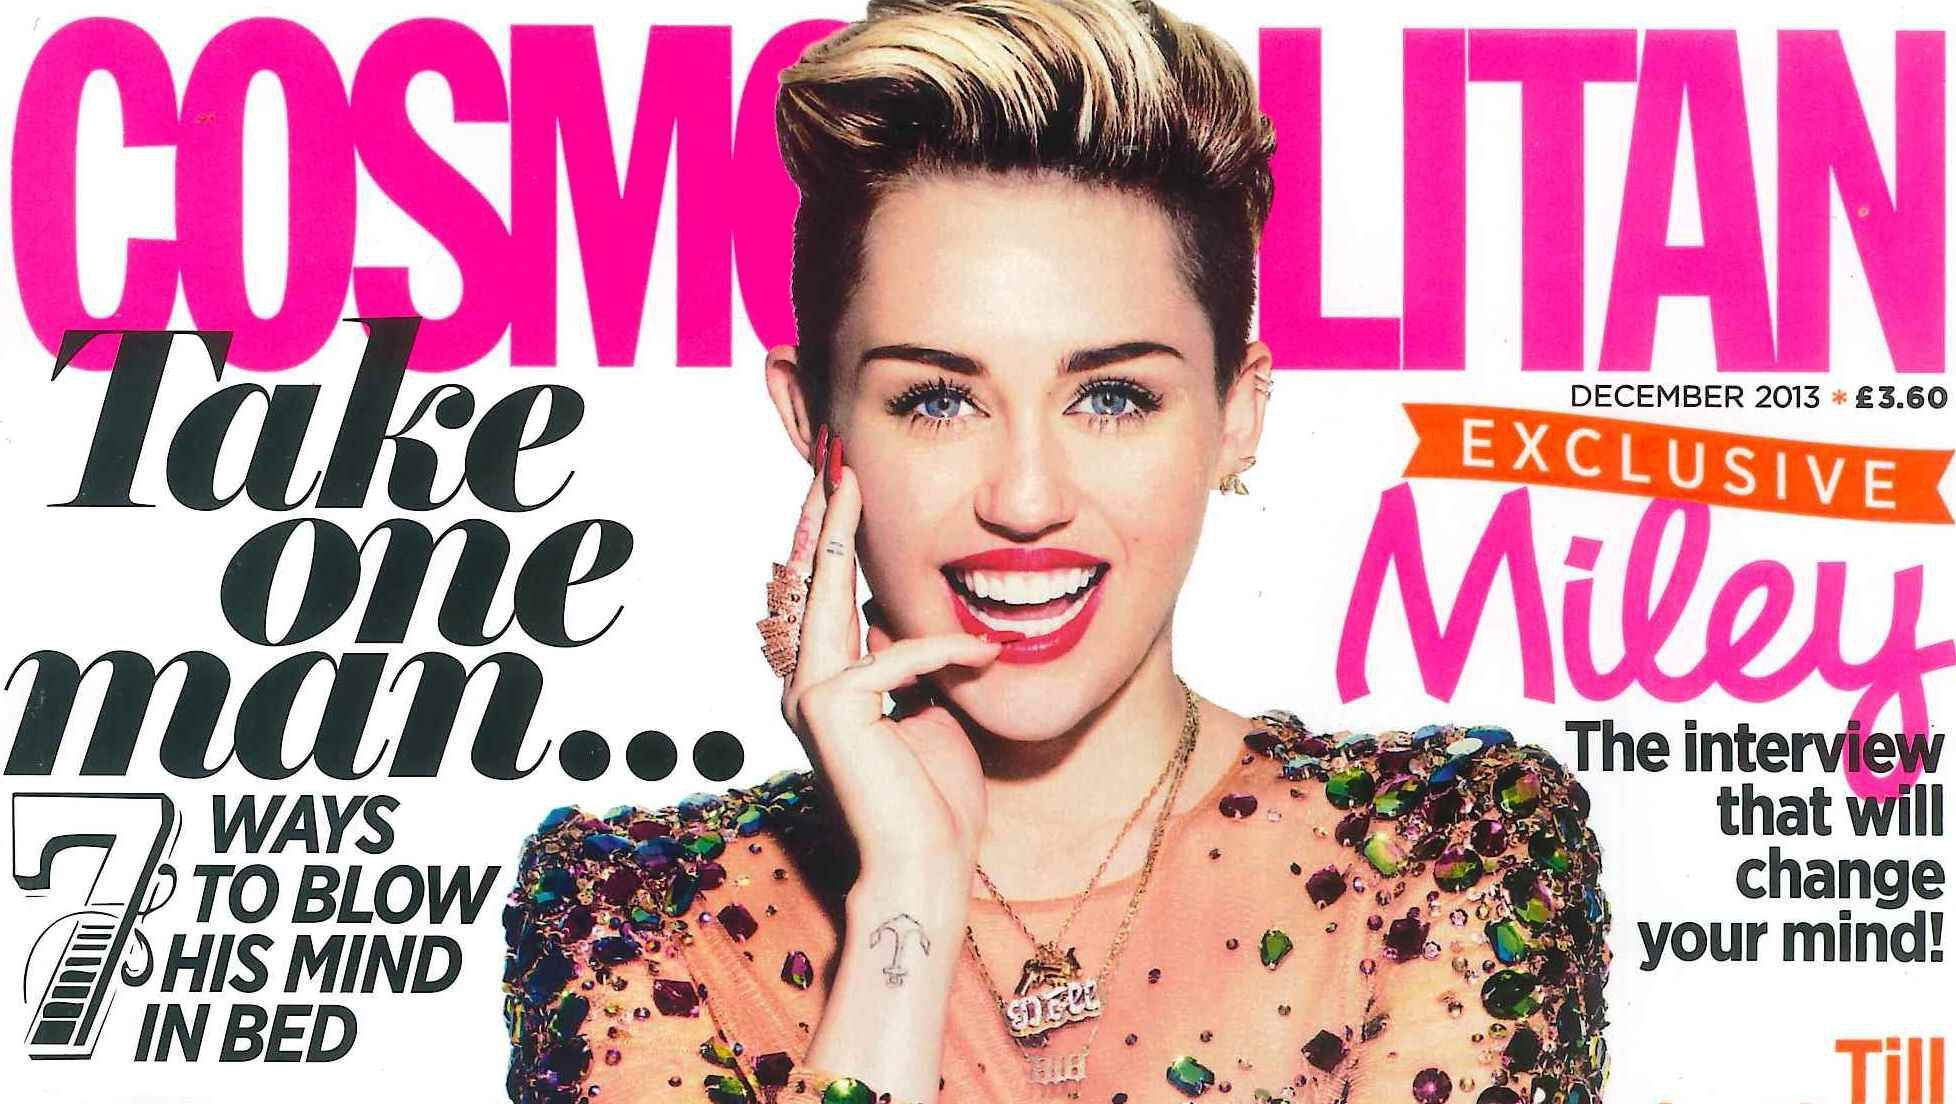 Cosmopolitan Wallpapers Hd